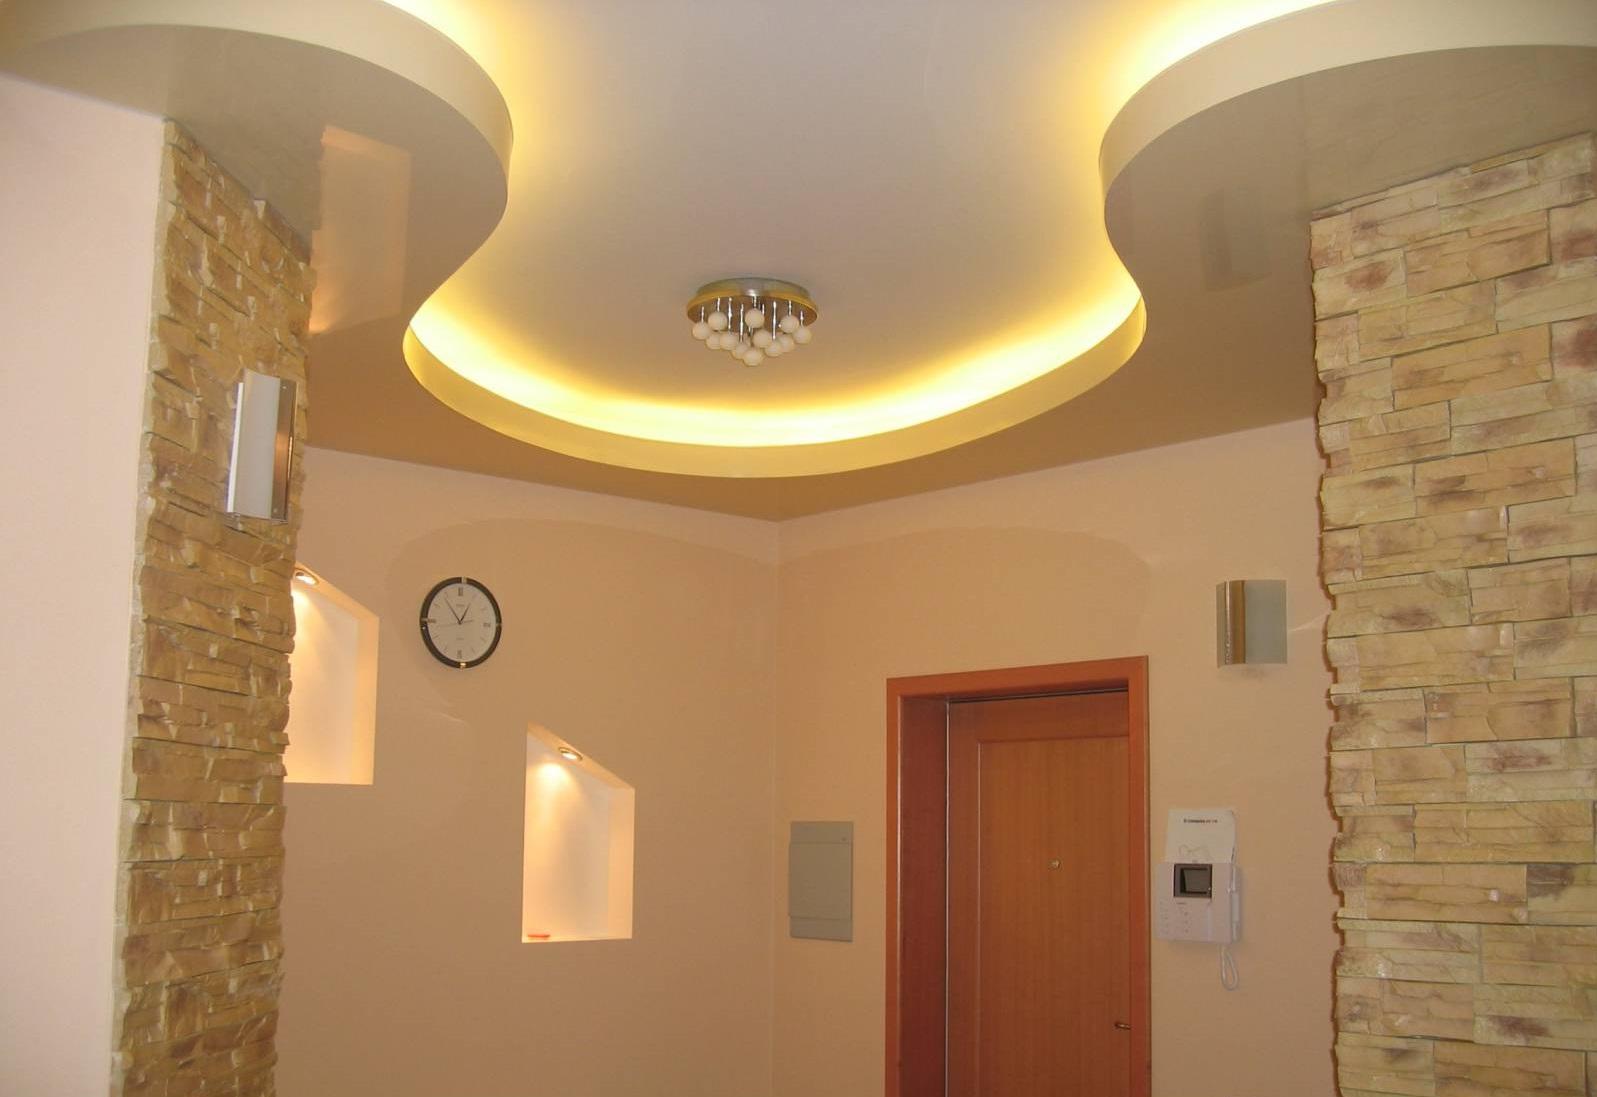 Потолки фото дизайн потолков в квартире